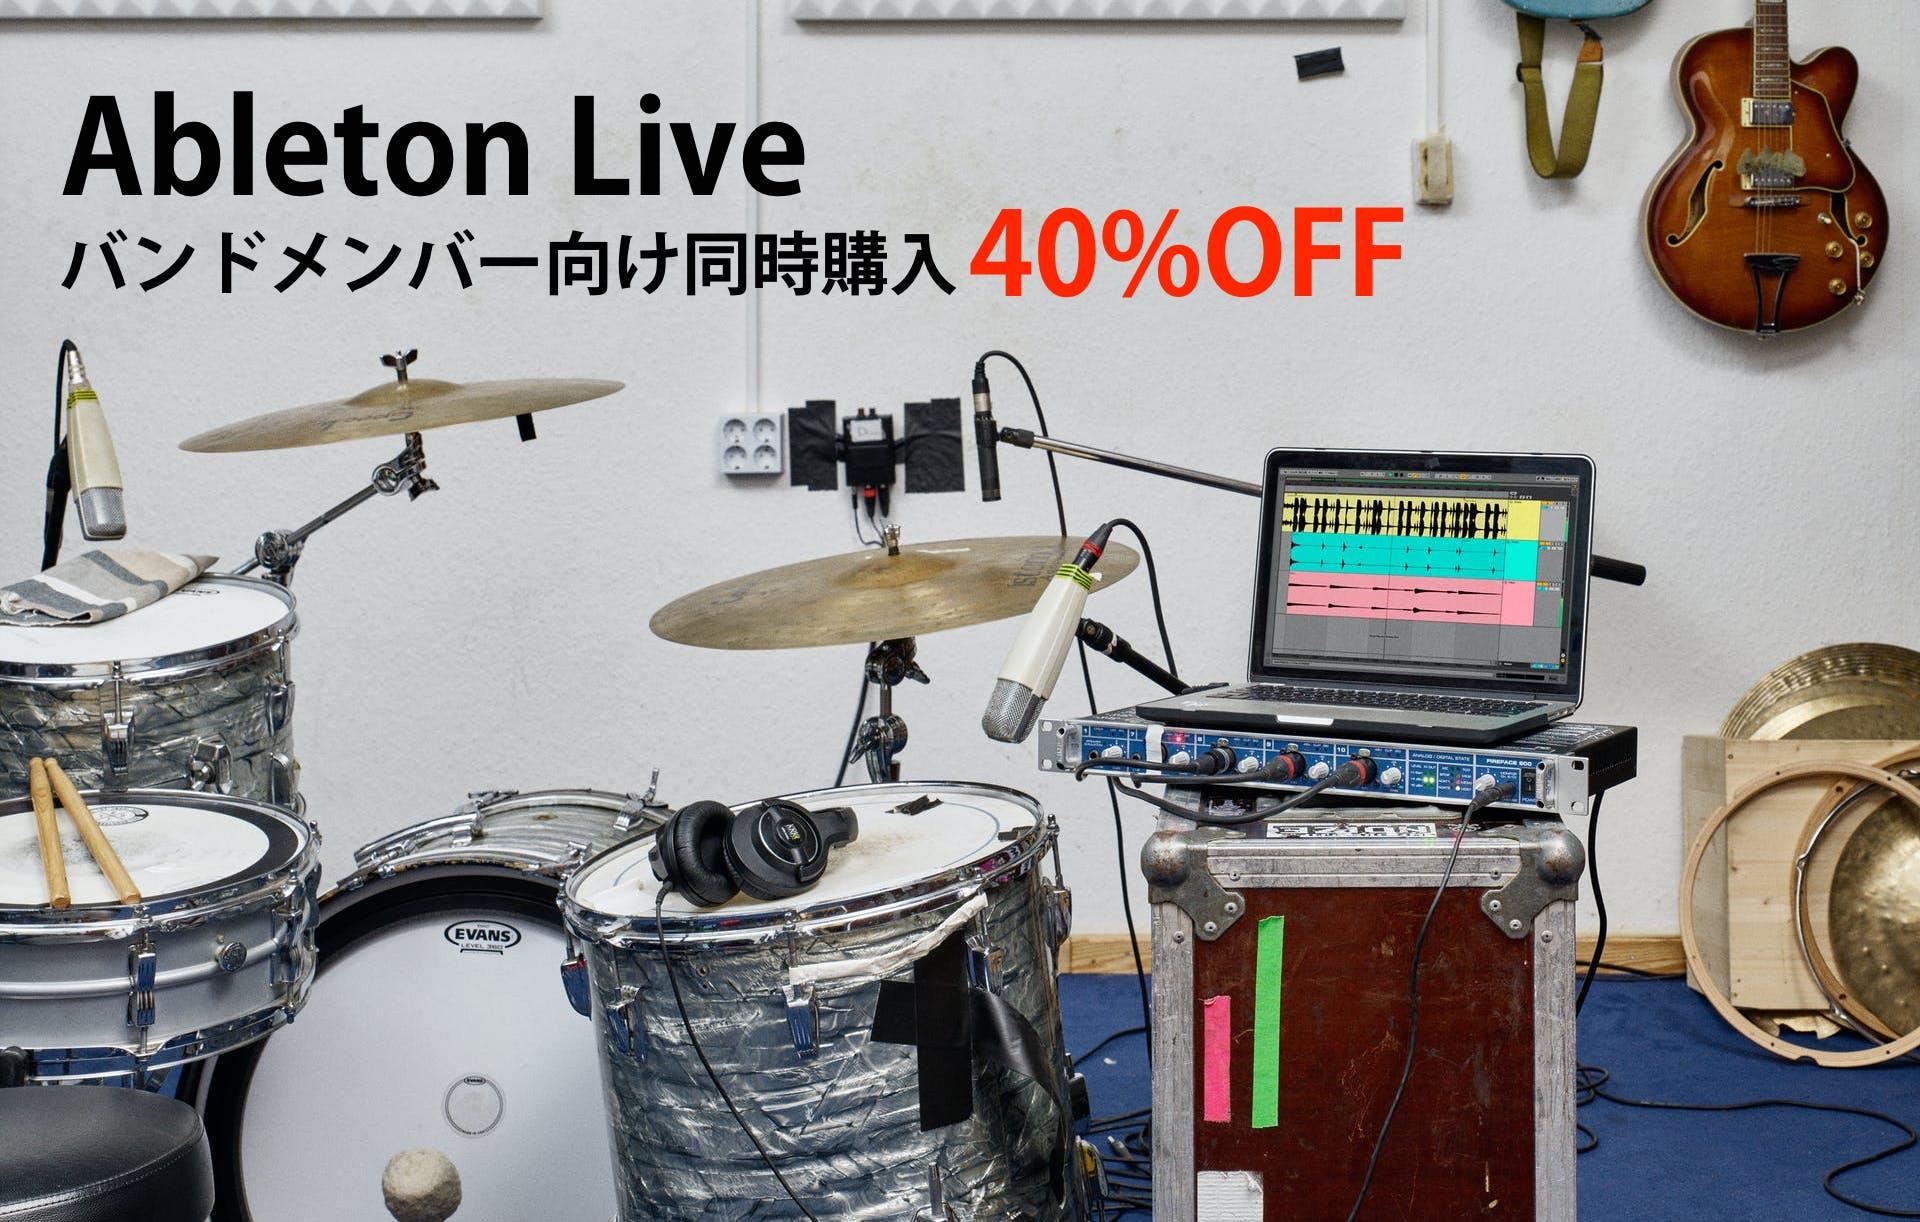 【40%OFF】Ableton Liveがバンドメンバー向け同時購入割引ライセンスを開始!